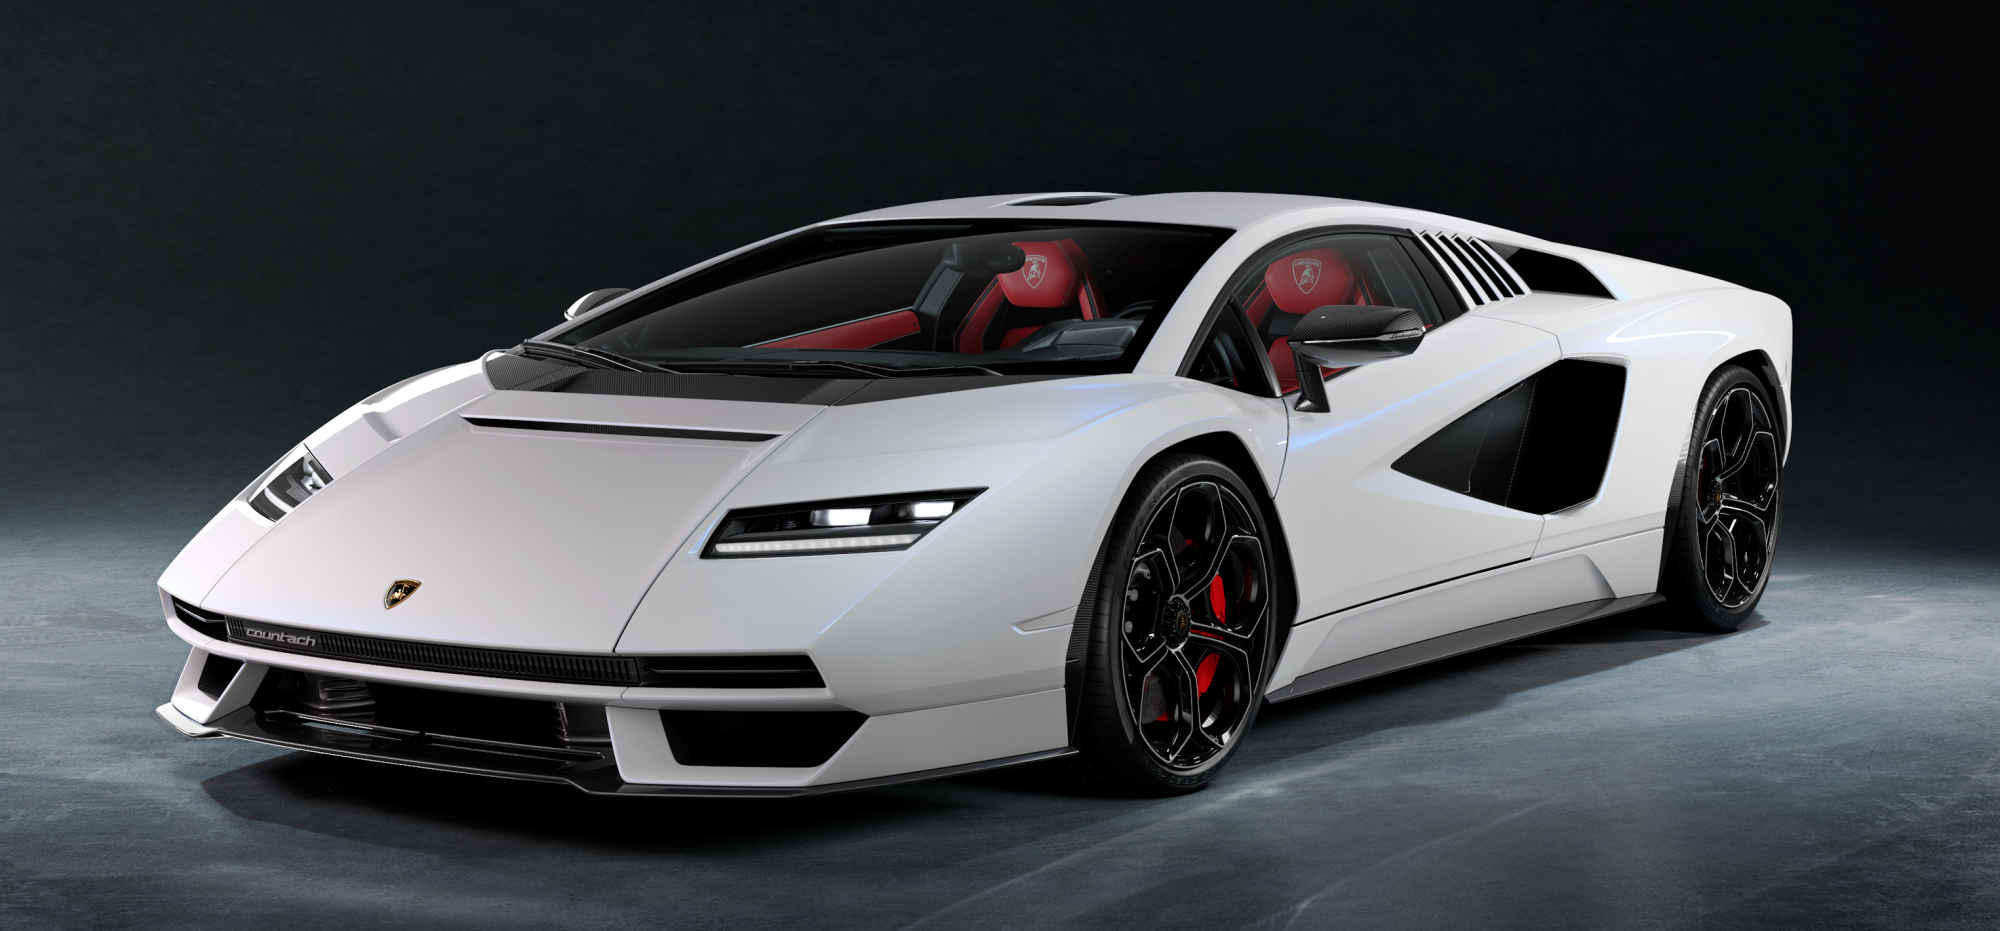 Lamborghini Countach LPI 800-4 przód